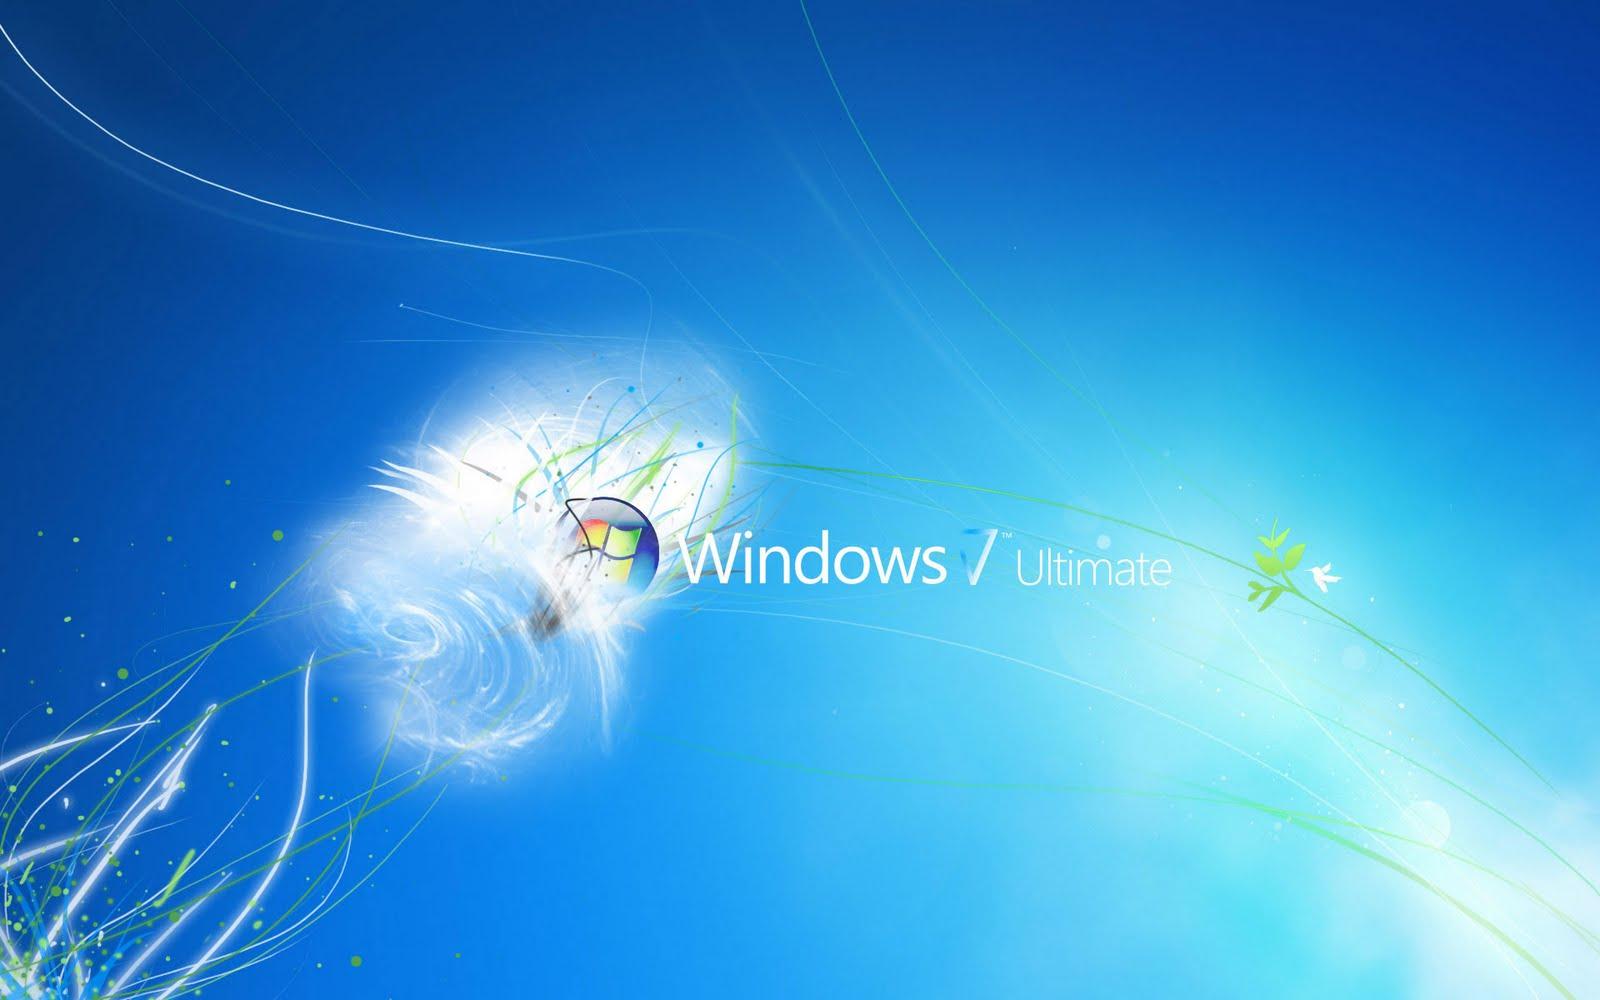 http://4.bp.blogspot.com/-uUAhQ4FBERo/TZLMN2q0SjI/AAAAAAAAH58/OyphsI3a4Gw/s1600/Premium-Windows-7-Wallpapers-opera-wallpaper-latest-2011-new-jagodunya-opera-lucy-pinder-pakistani-desi-arabic-indian-tamil-super-super-wows-gold-glass-red-super-babes-desktop-wi